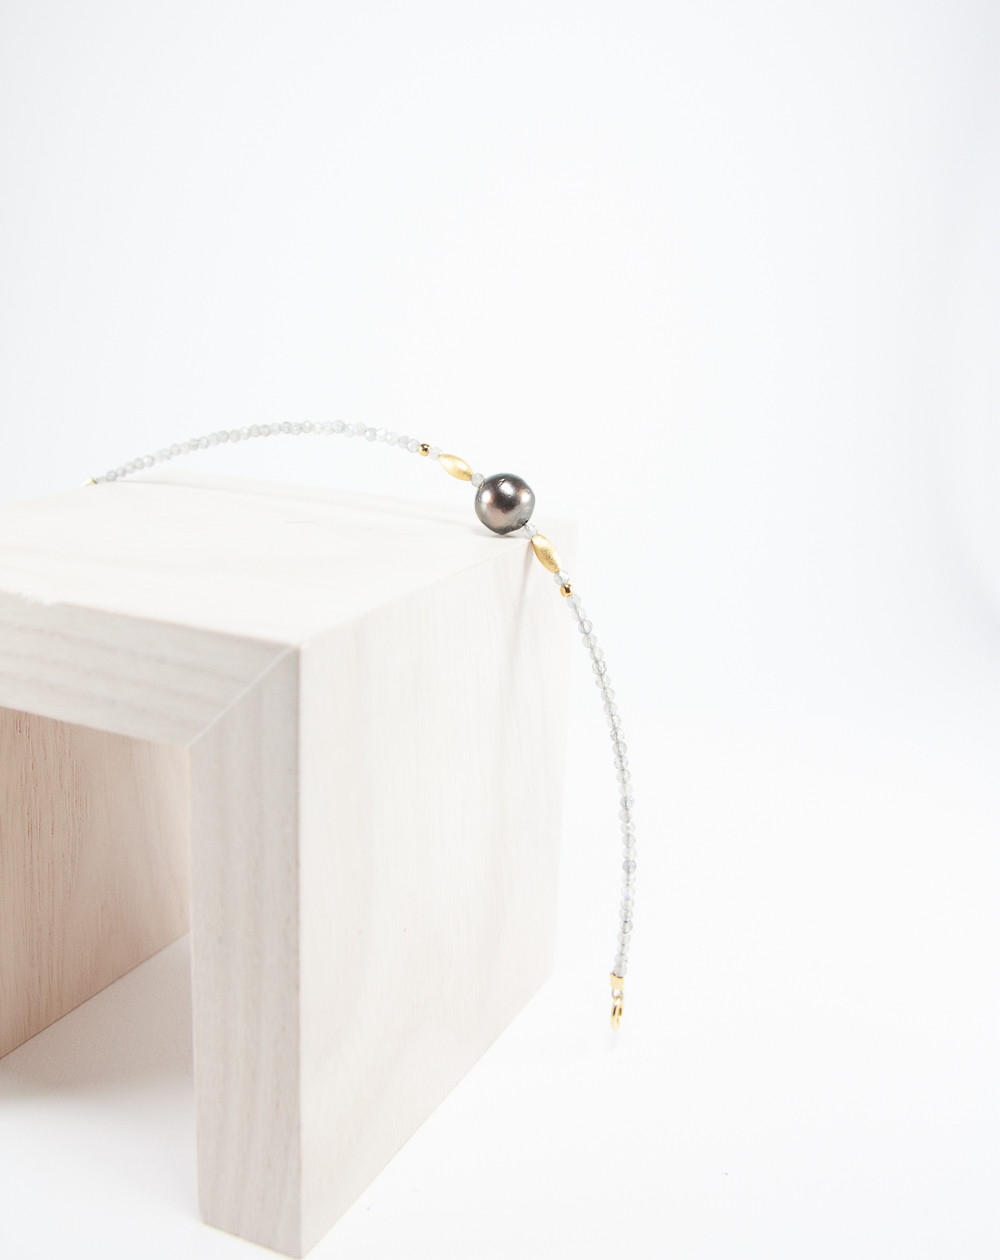 Bracelet Signature Labradorite Perle de Tahiti, Sanuk Création. Créateurs Français